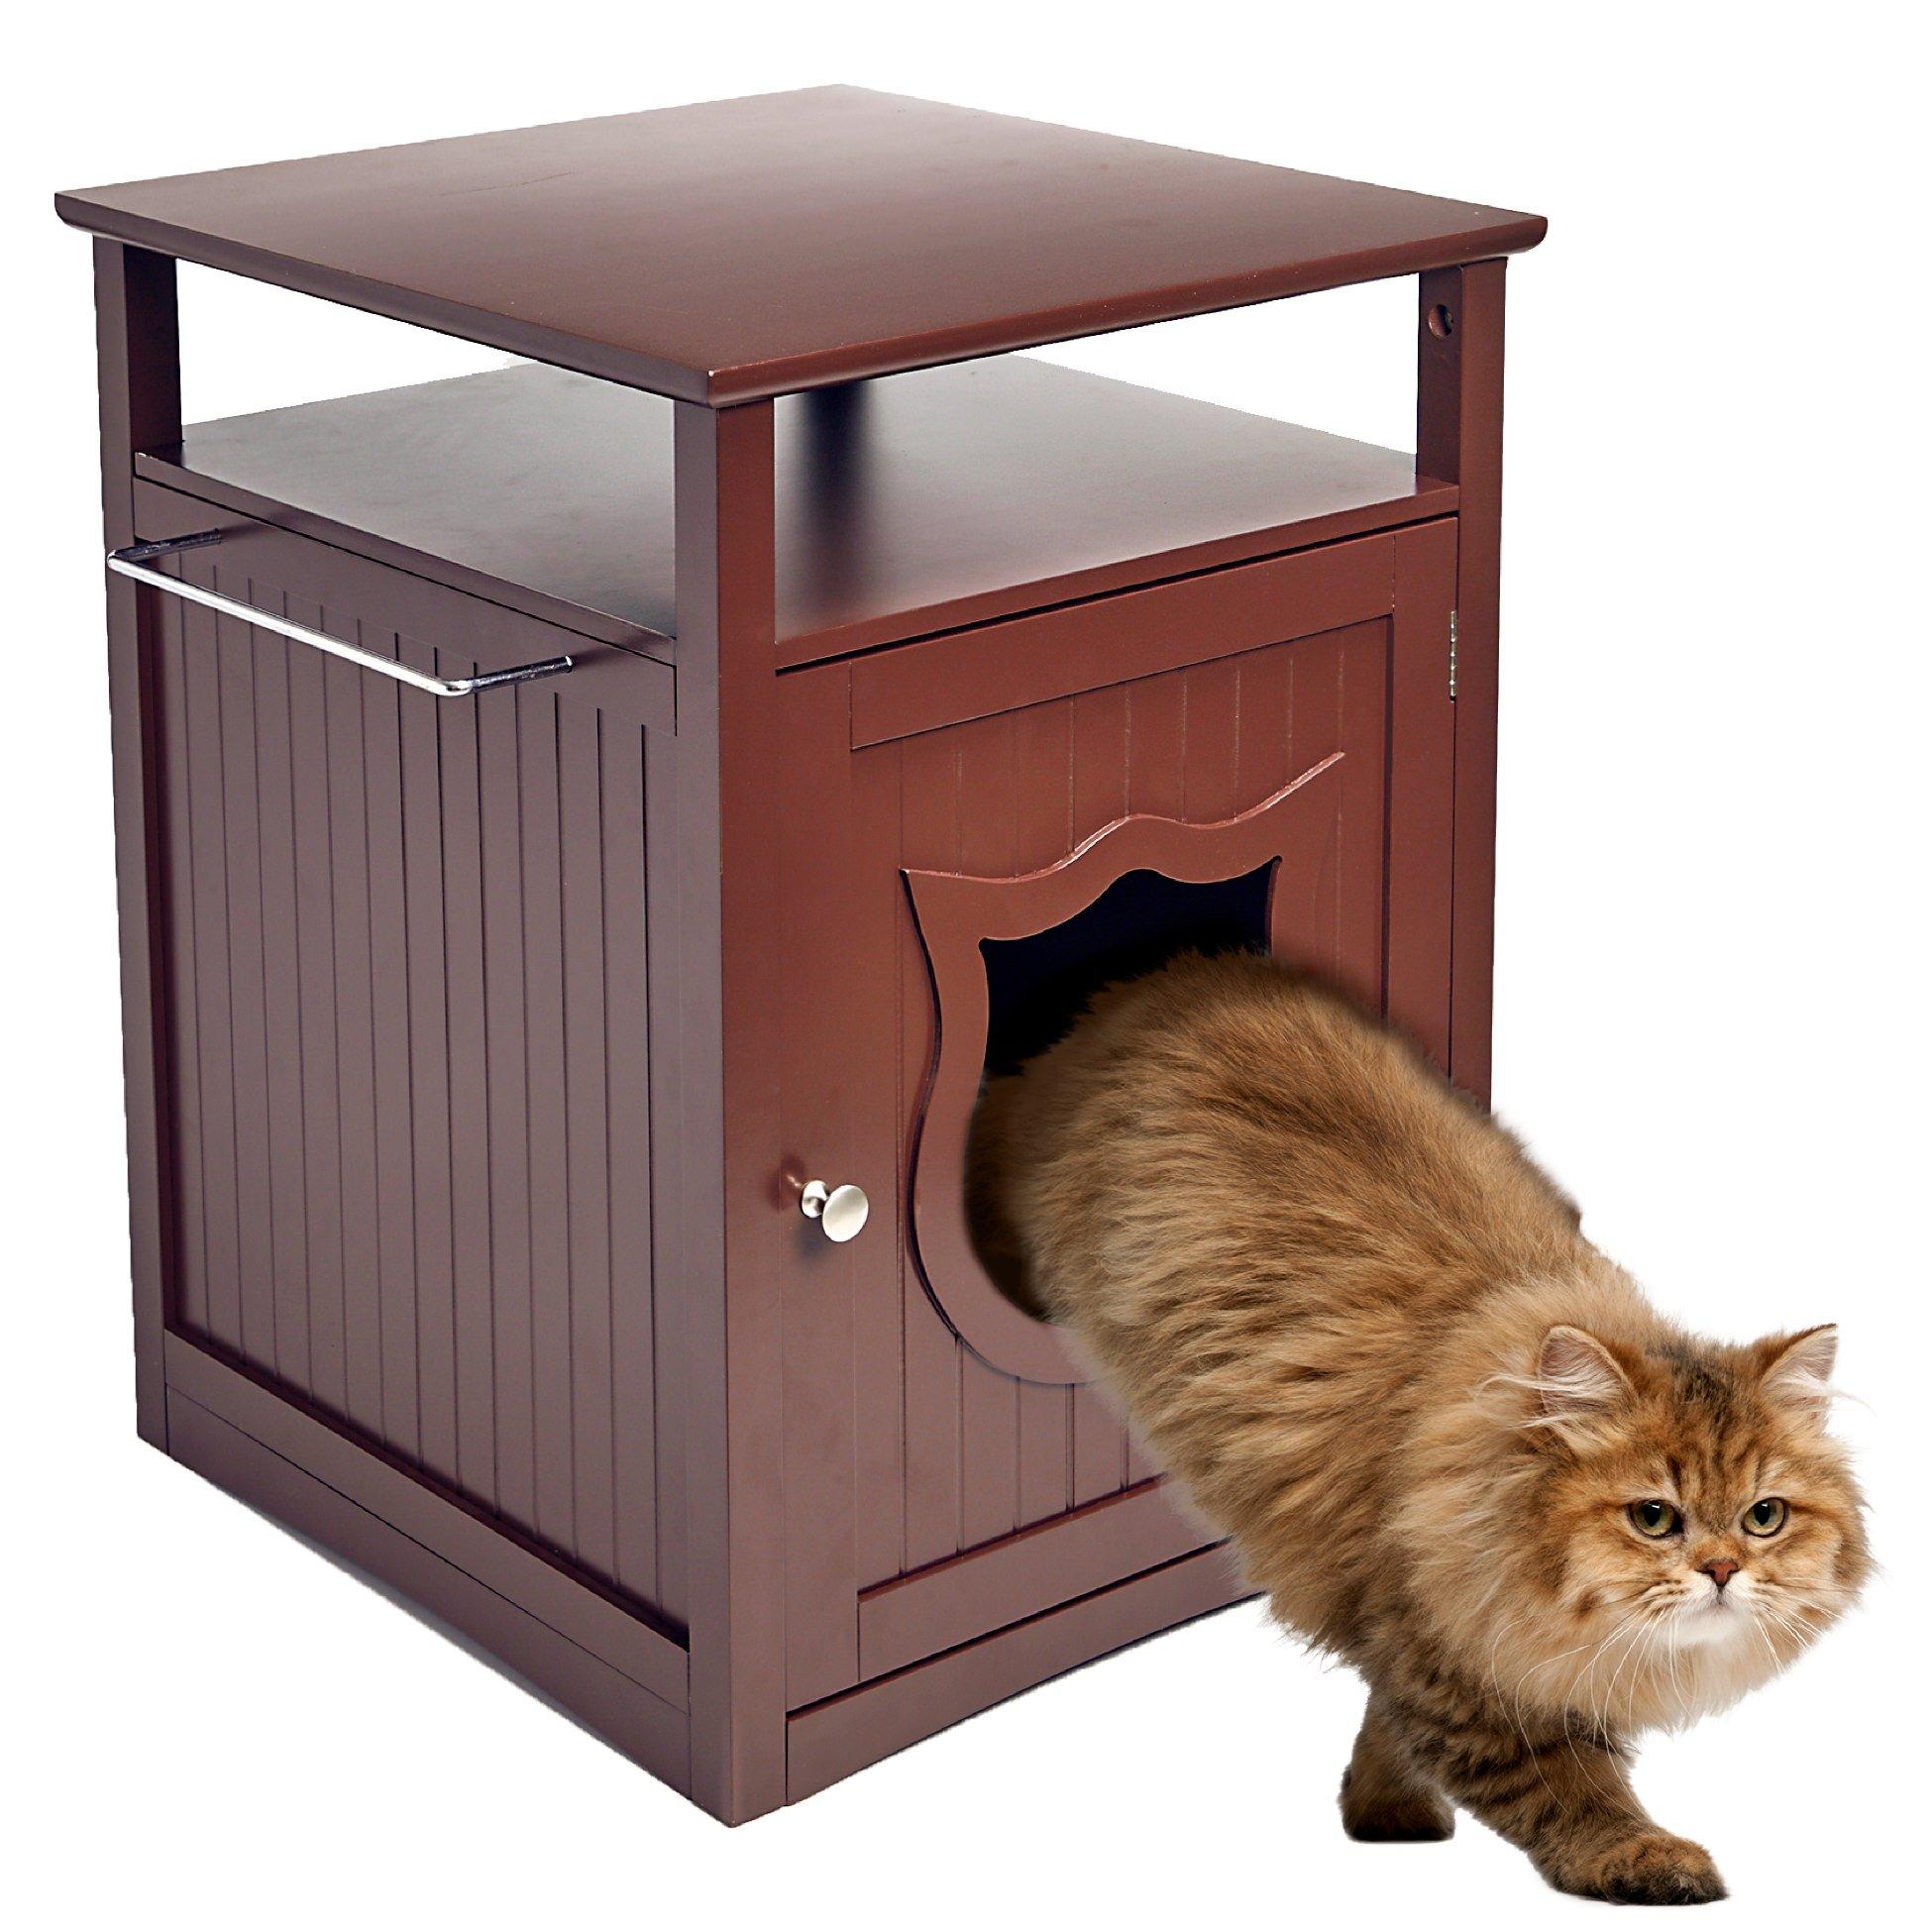 Pet Hup Hup Kitty Cat Thunder Box Nightstand Pet House/Cat Litter Box Cover CHERRY